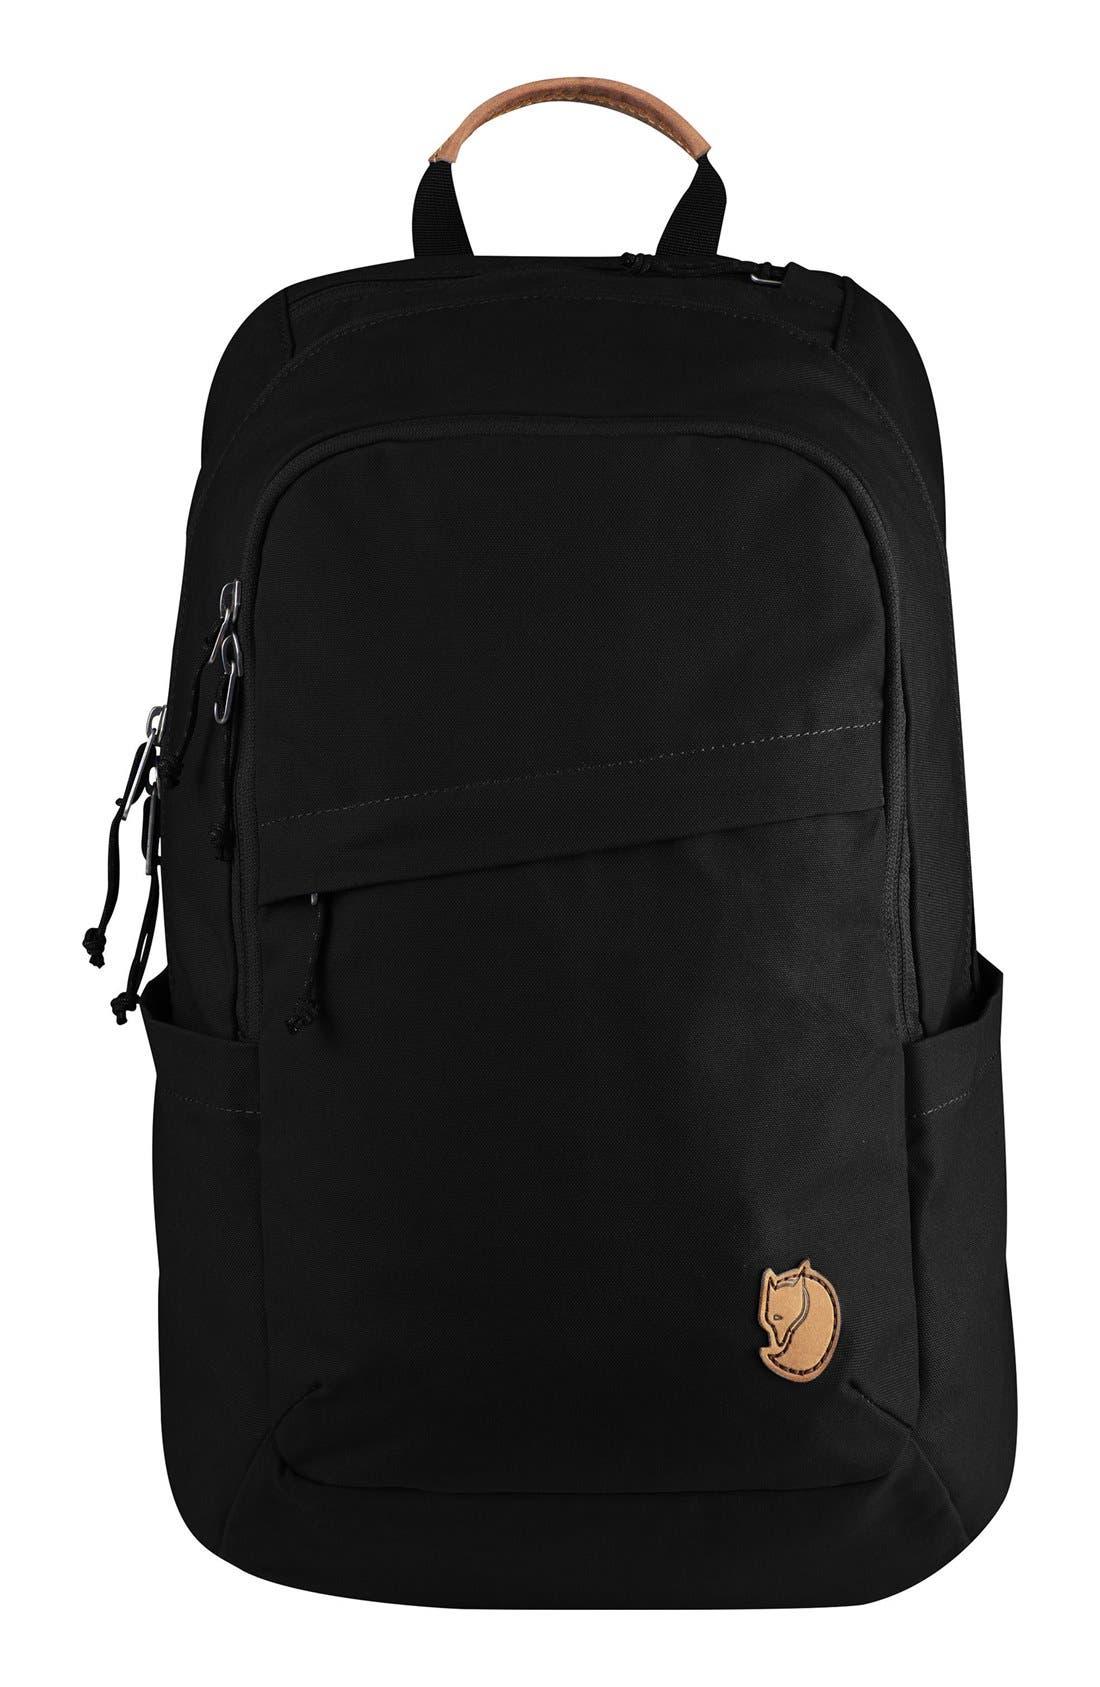 FJÄLLRÄVEN Raven 20L Backpack